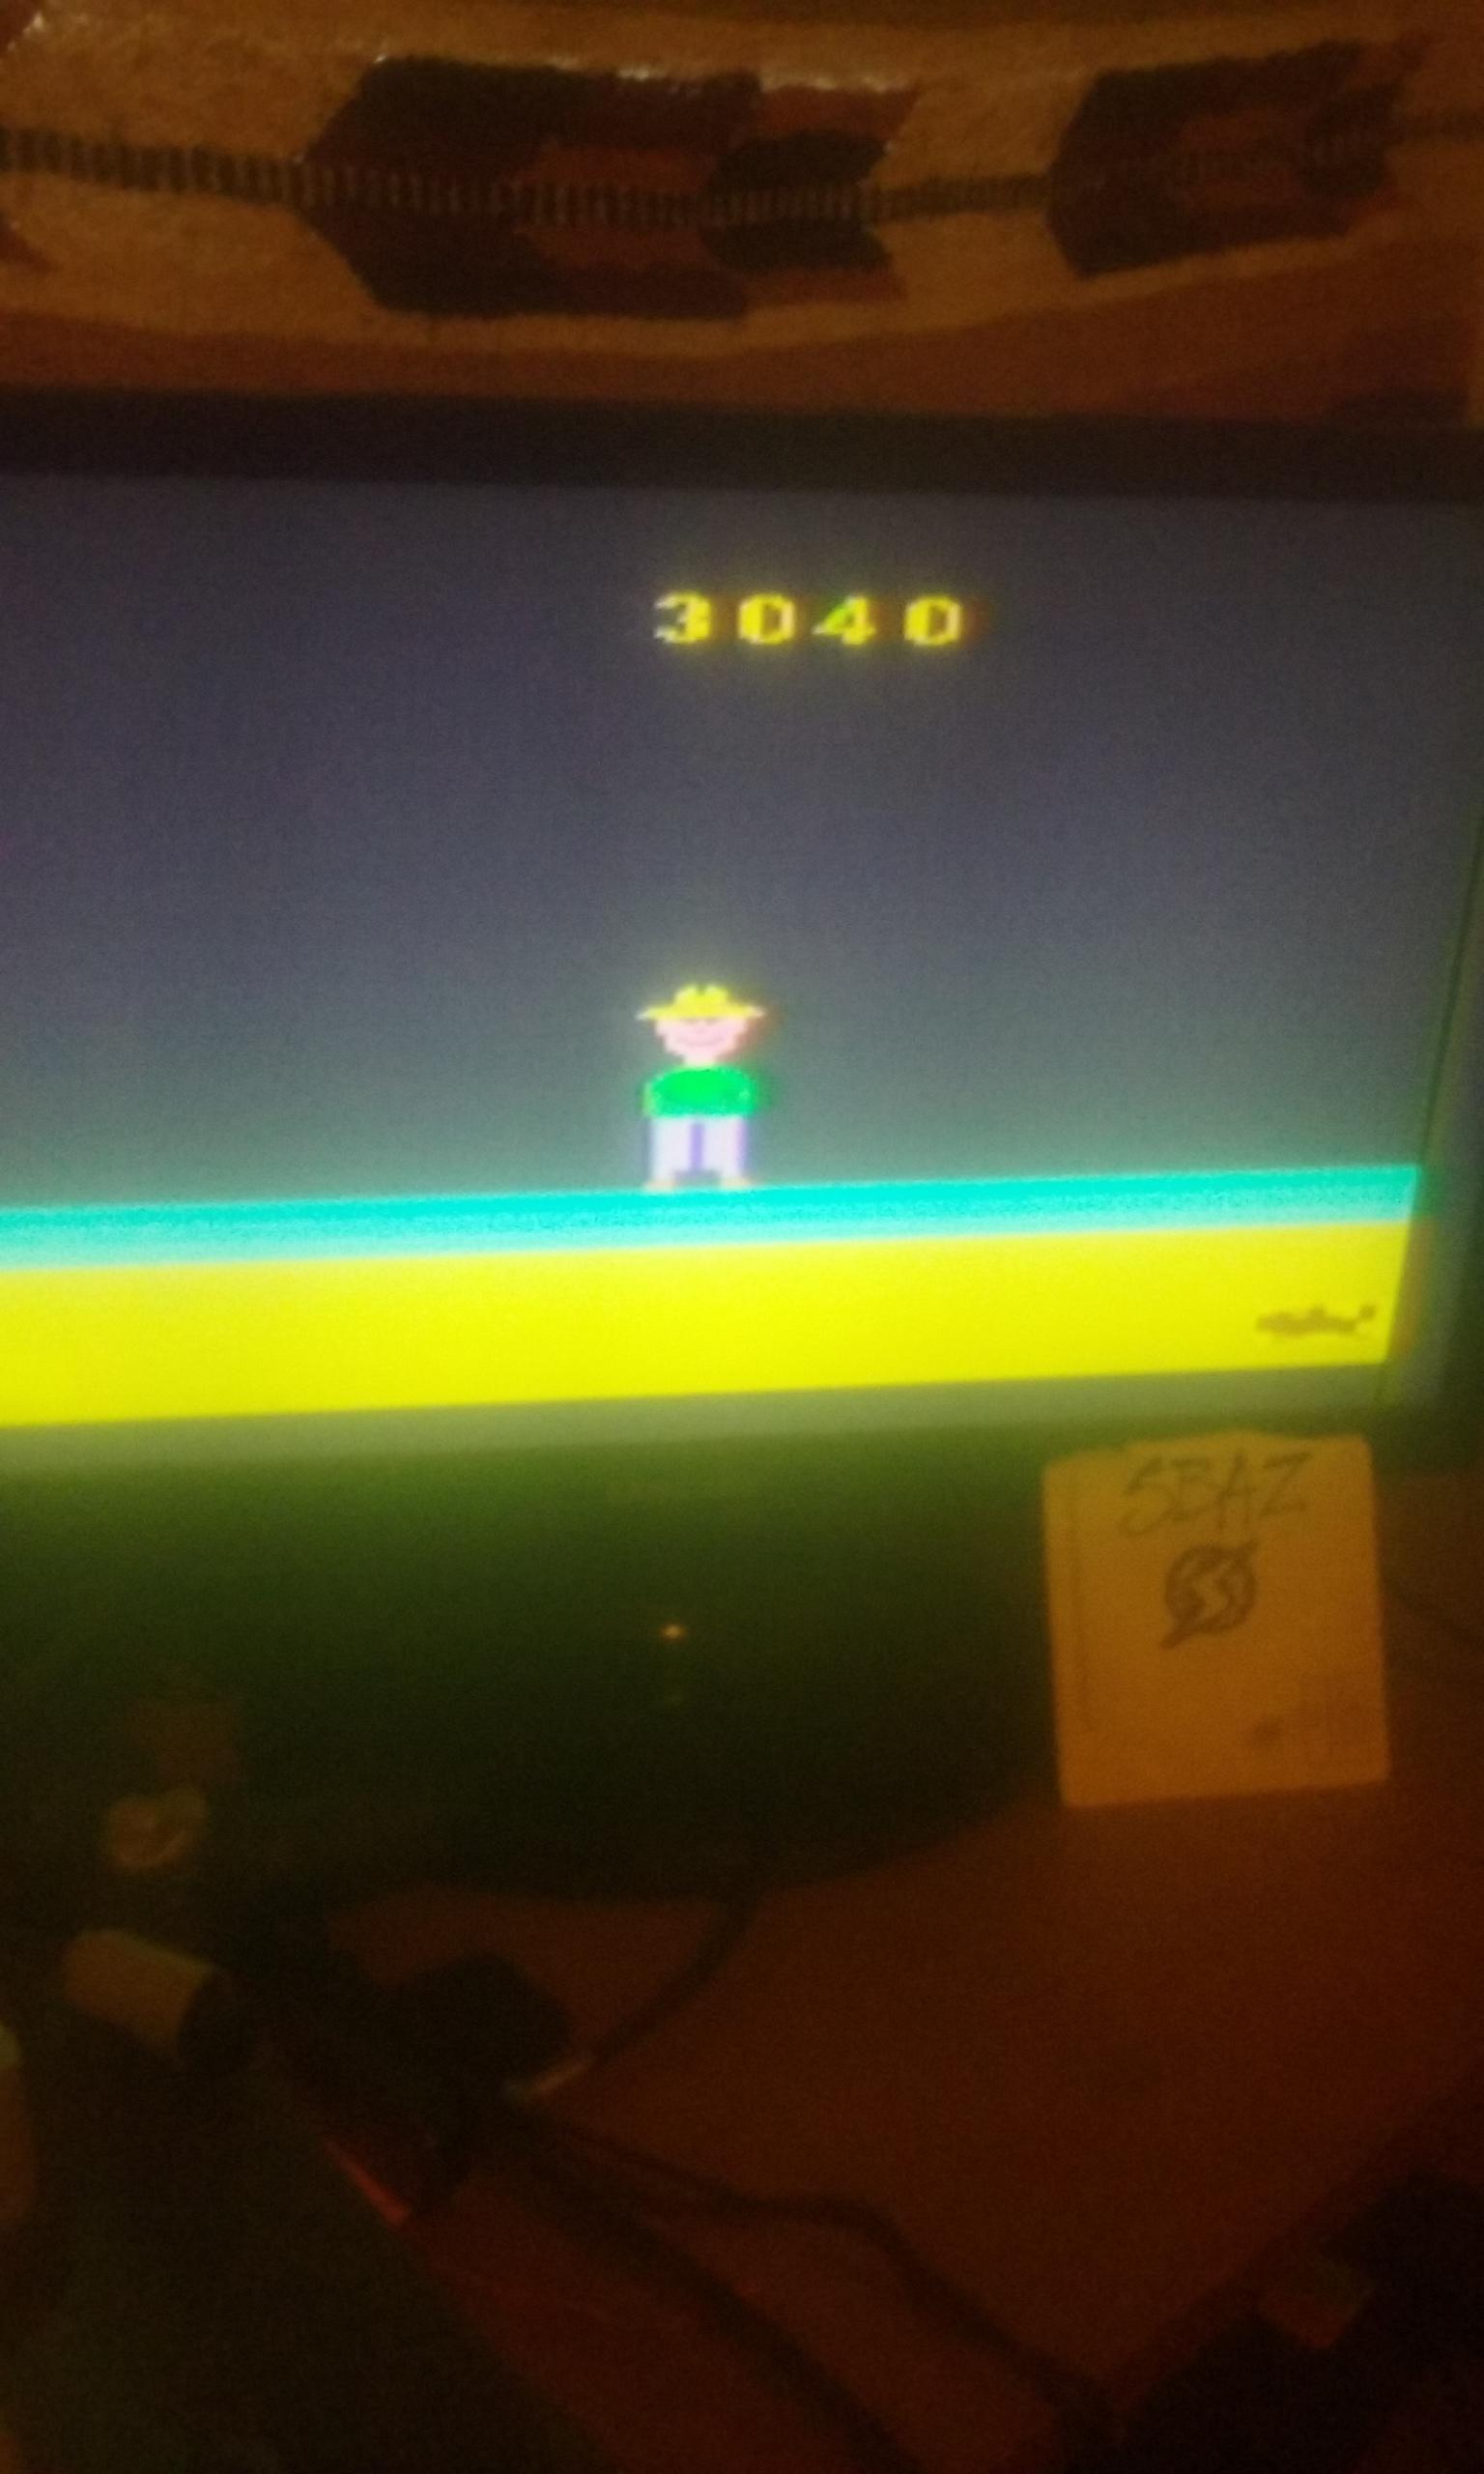 S.BAZ: Gopher (Atari 2600 Novice/B) 3,040 points on 2019-01-29 02:21:02